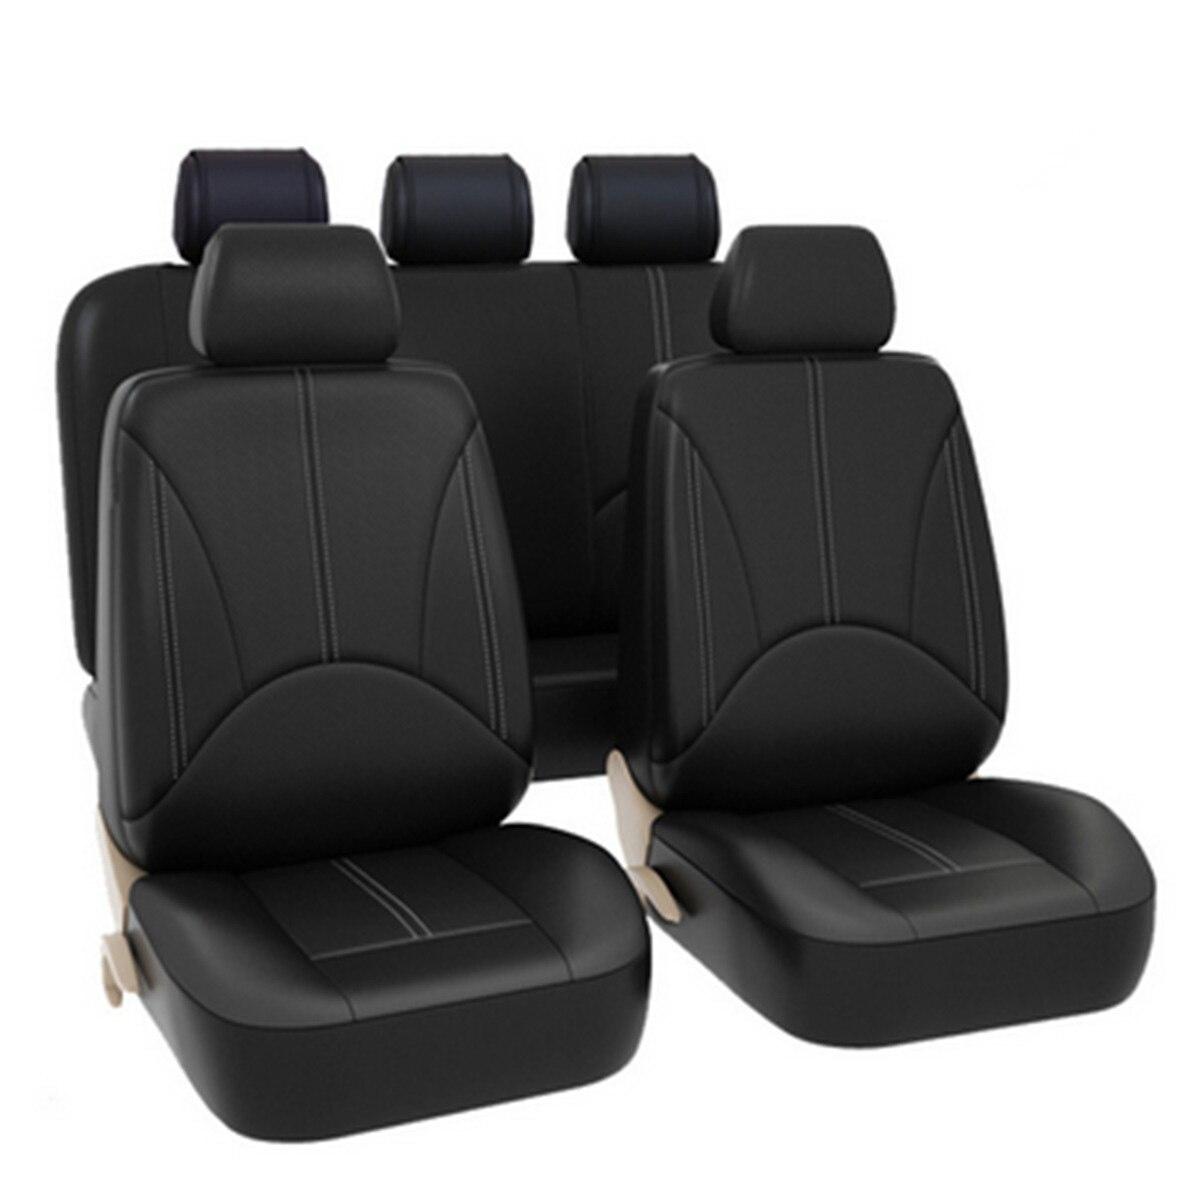 Back Seat Cover Head Rest Parts Car Auto Universal Dirt resistant Black